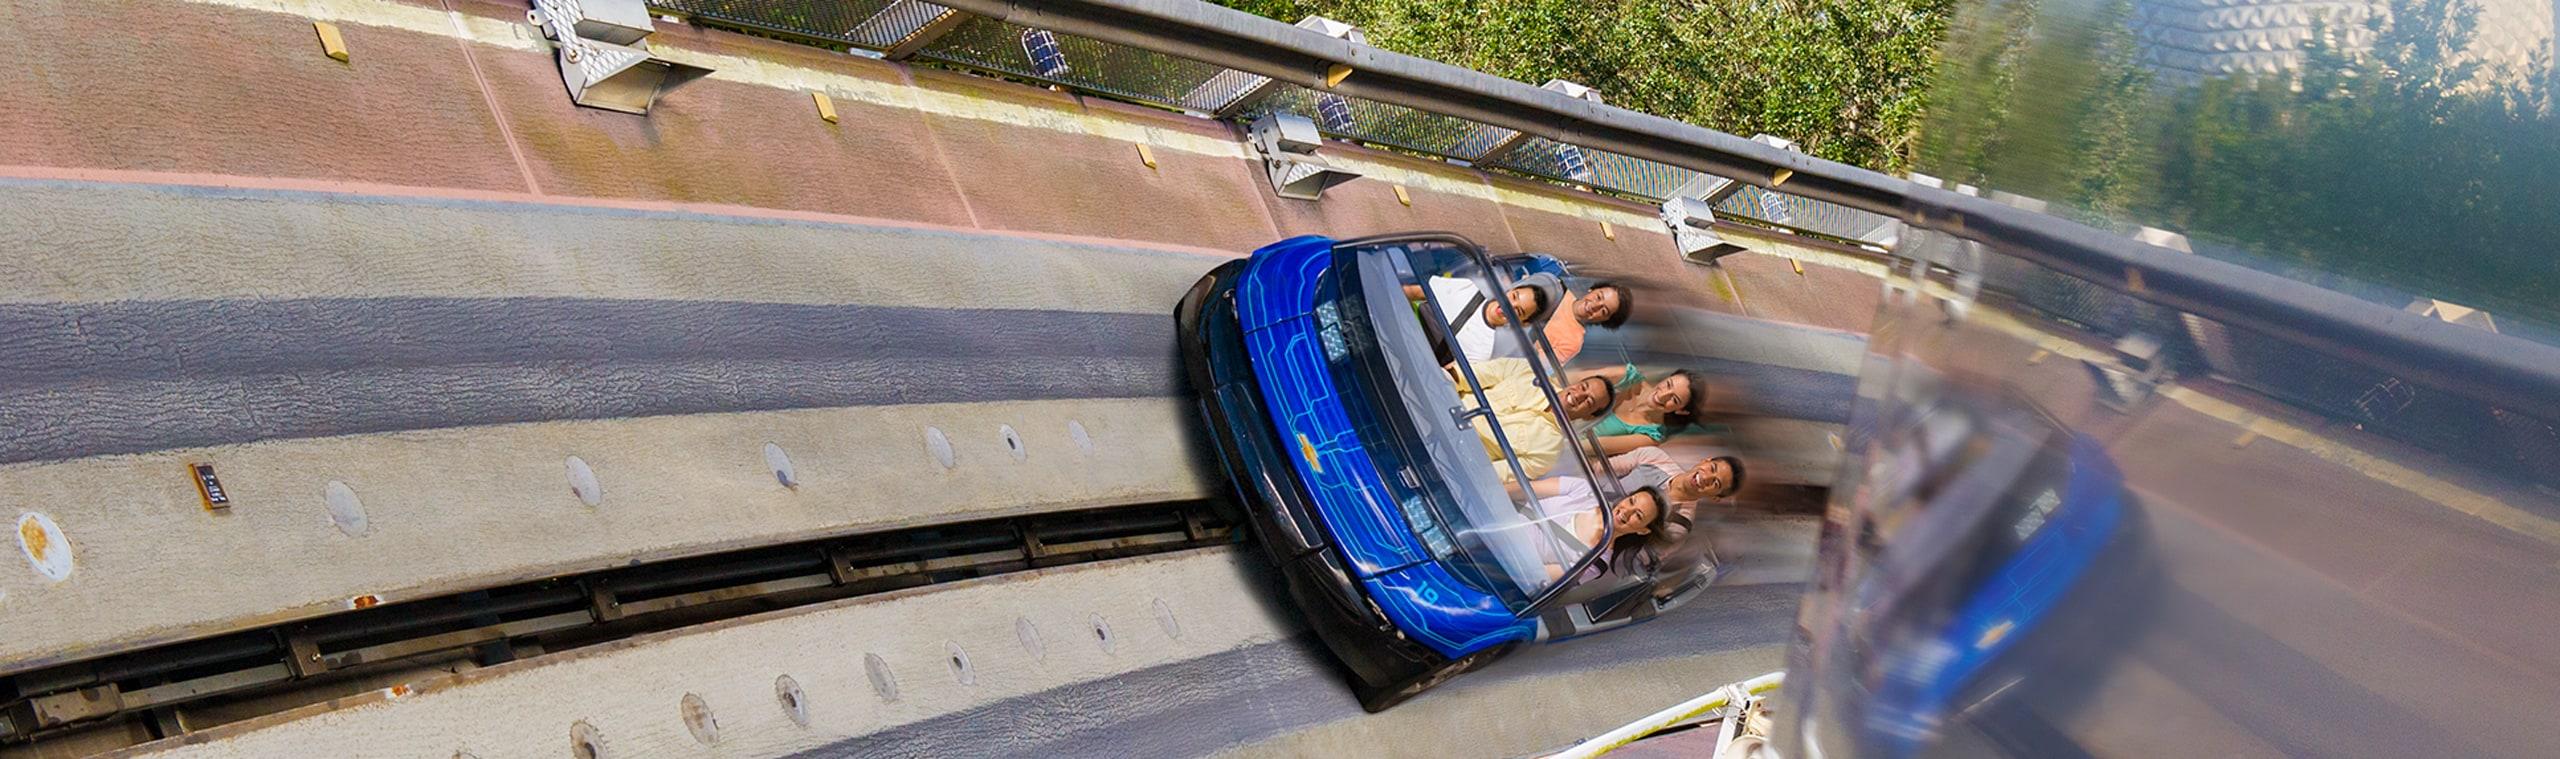 A family smiles on a roller coaster